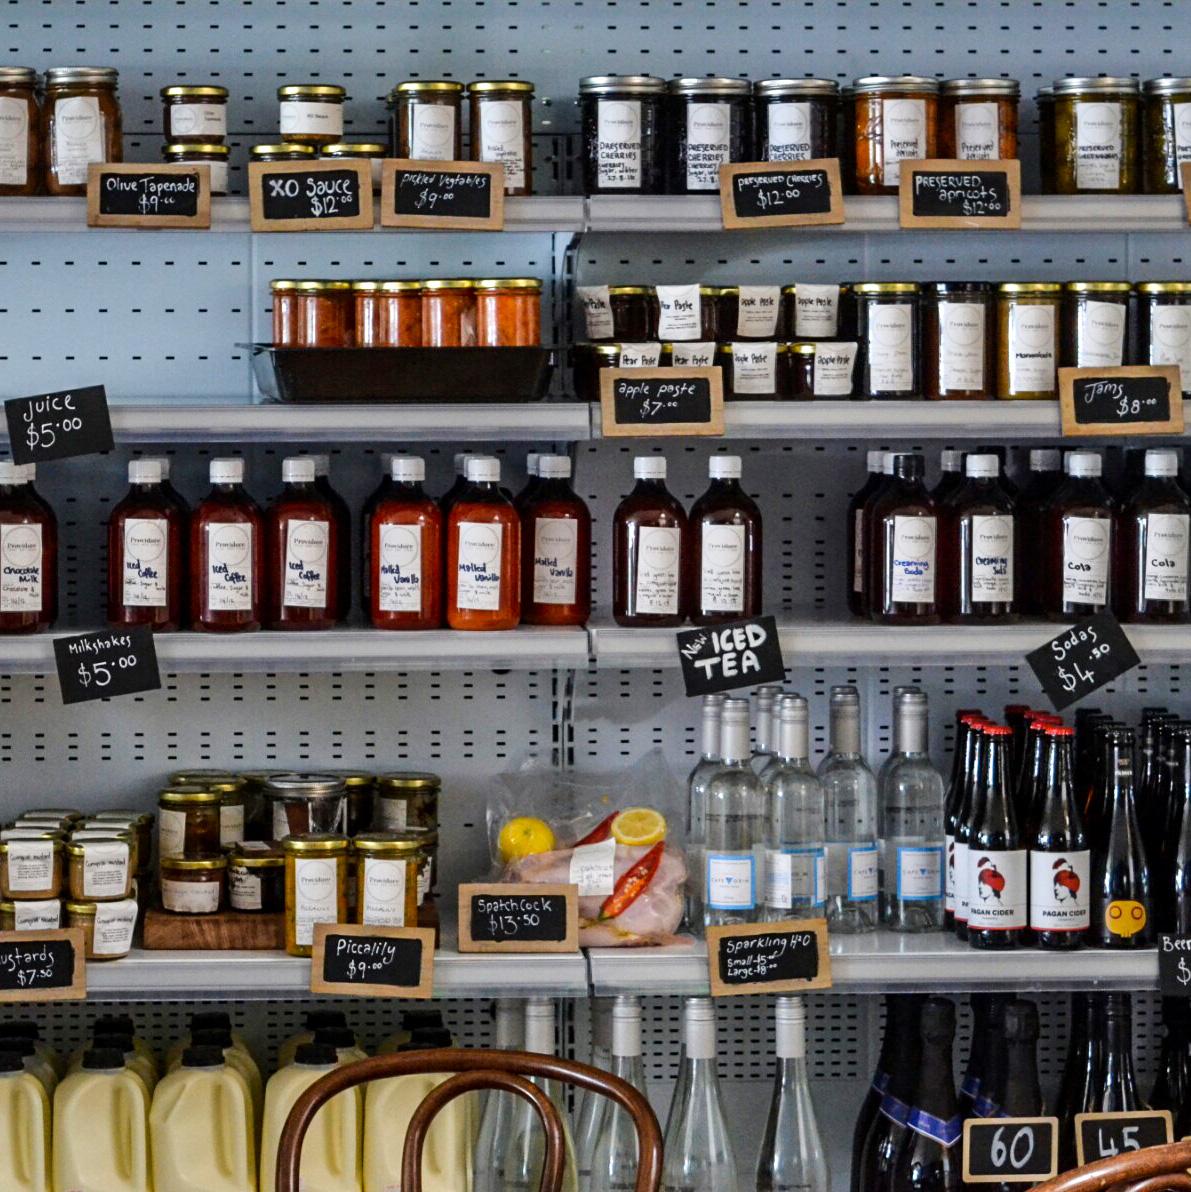 Ethos Restaurant Pantry, Hobart Australia - Photo by Julia Reynolds.jpg